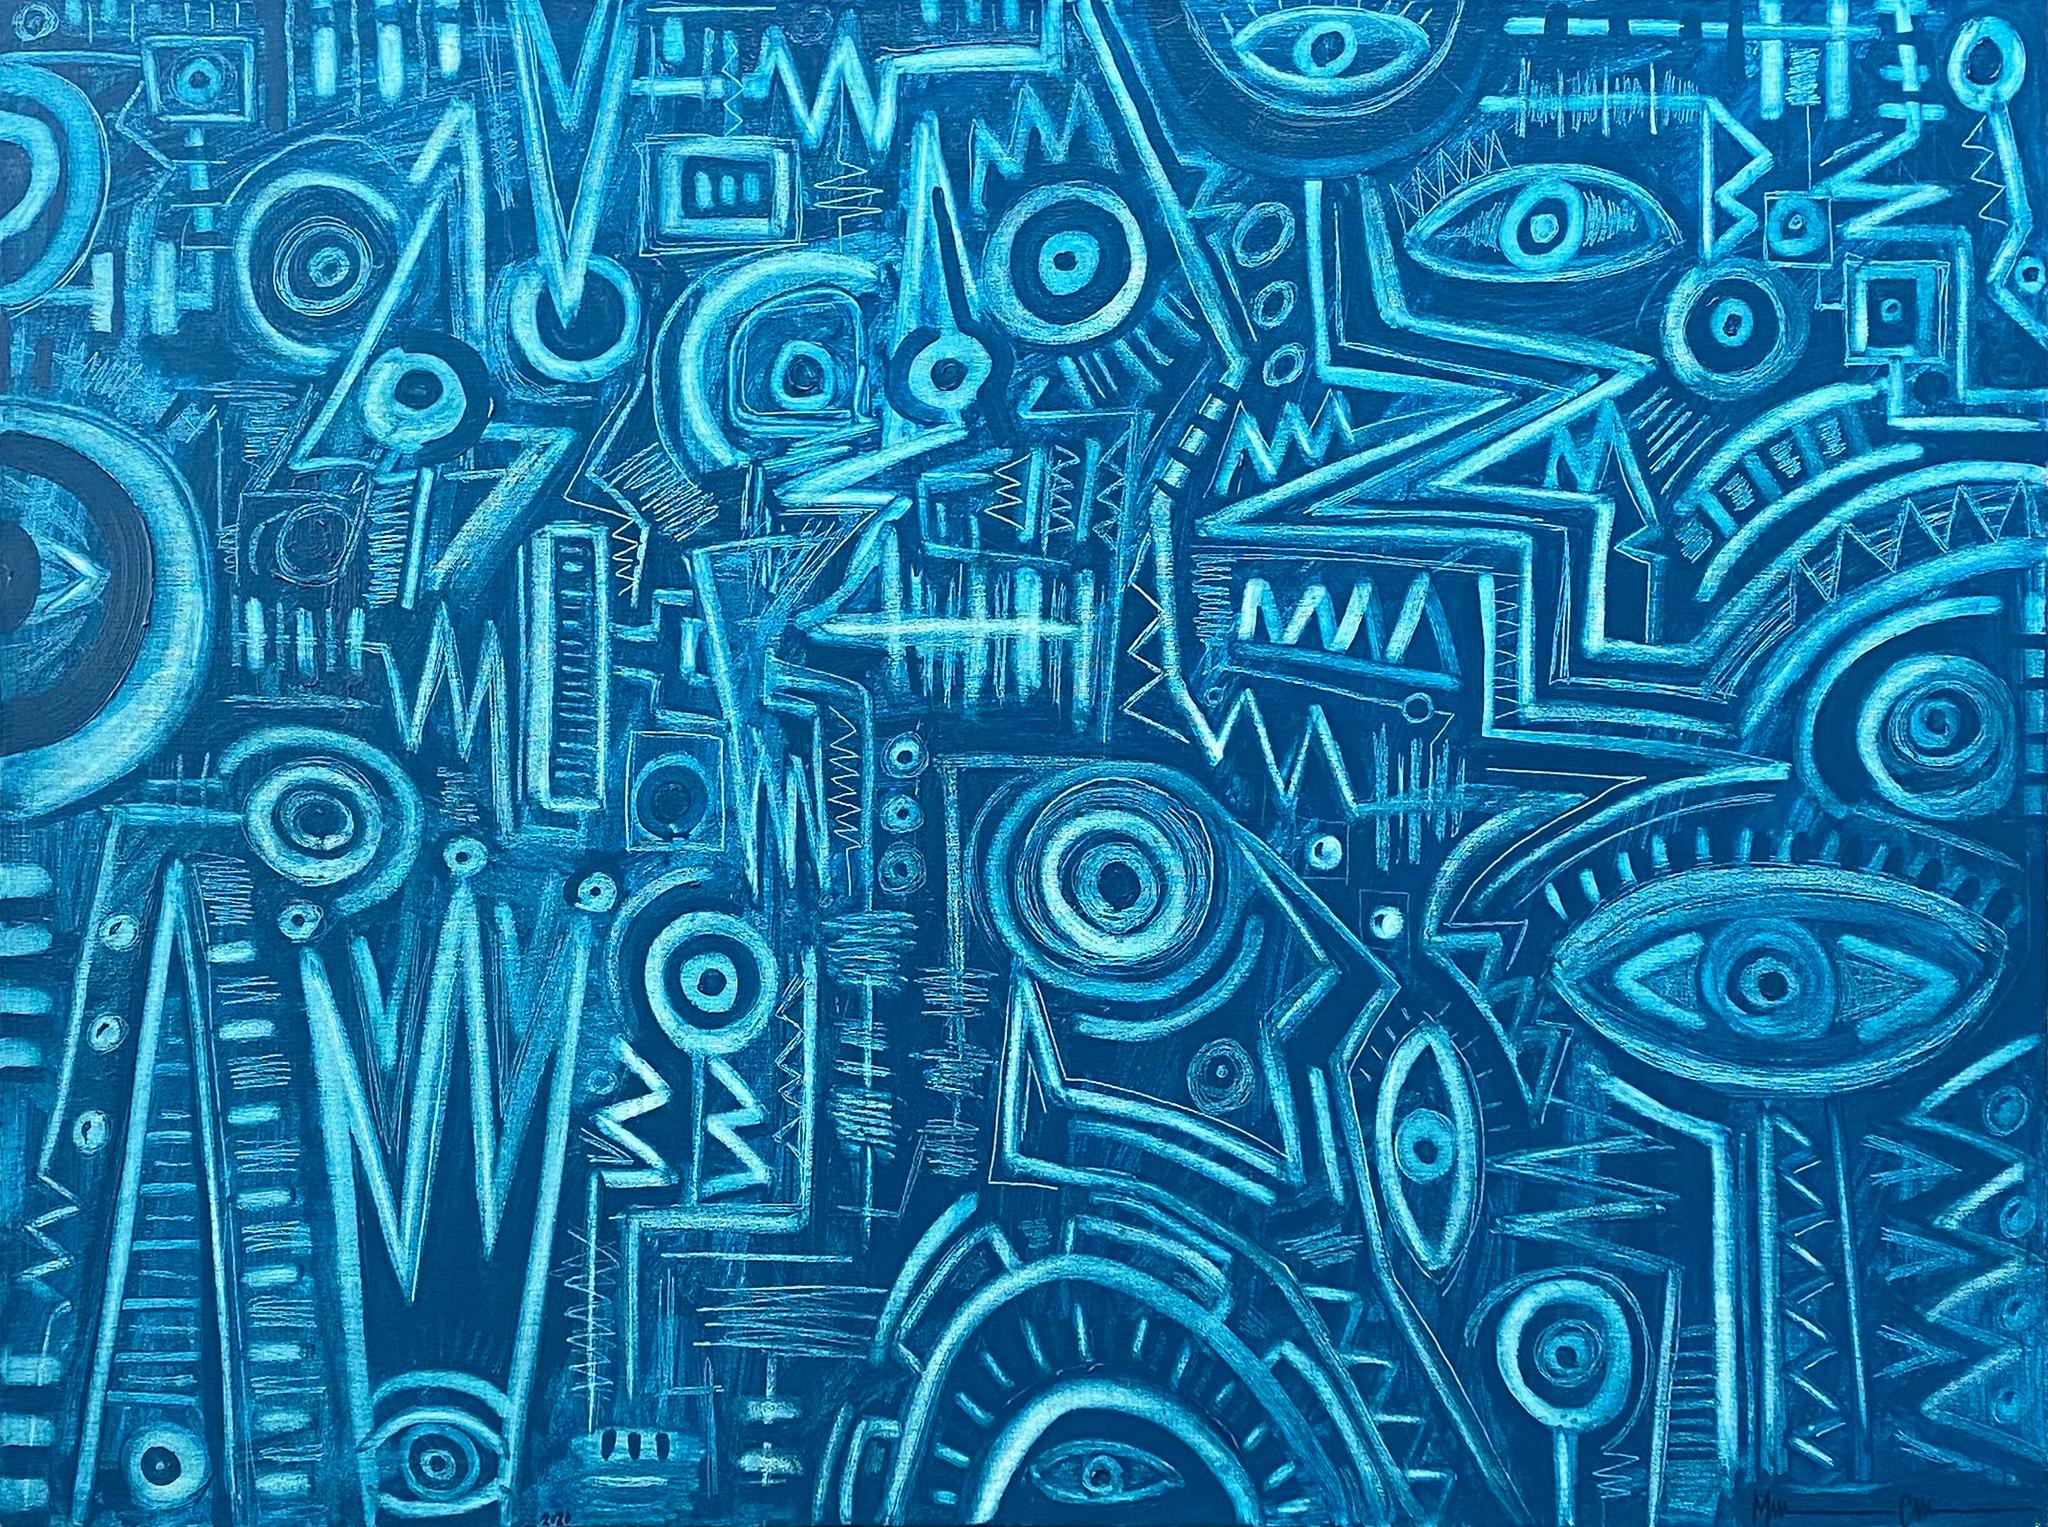 Aquamarine, Contemporary Art, Abstract Painting, 21st Century